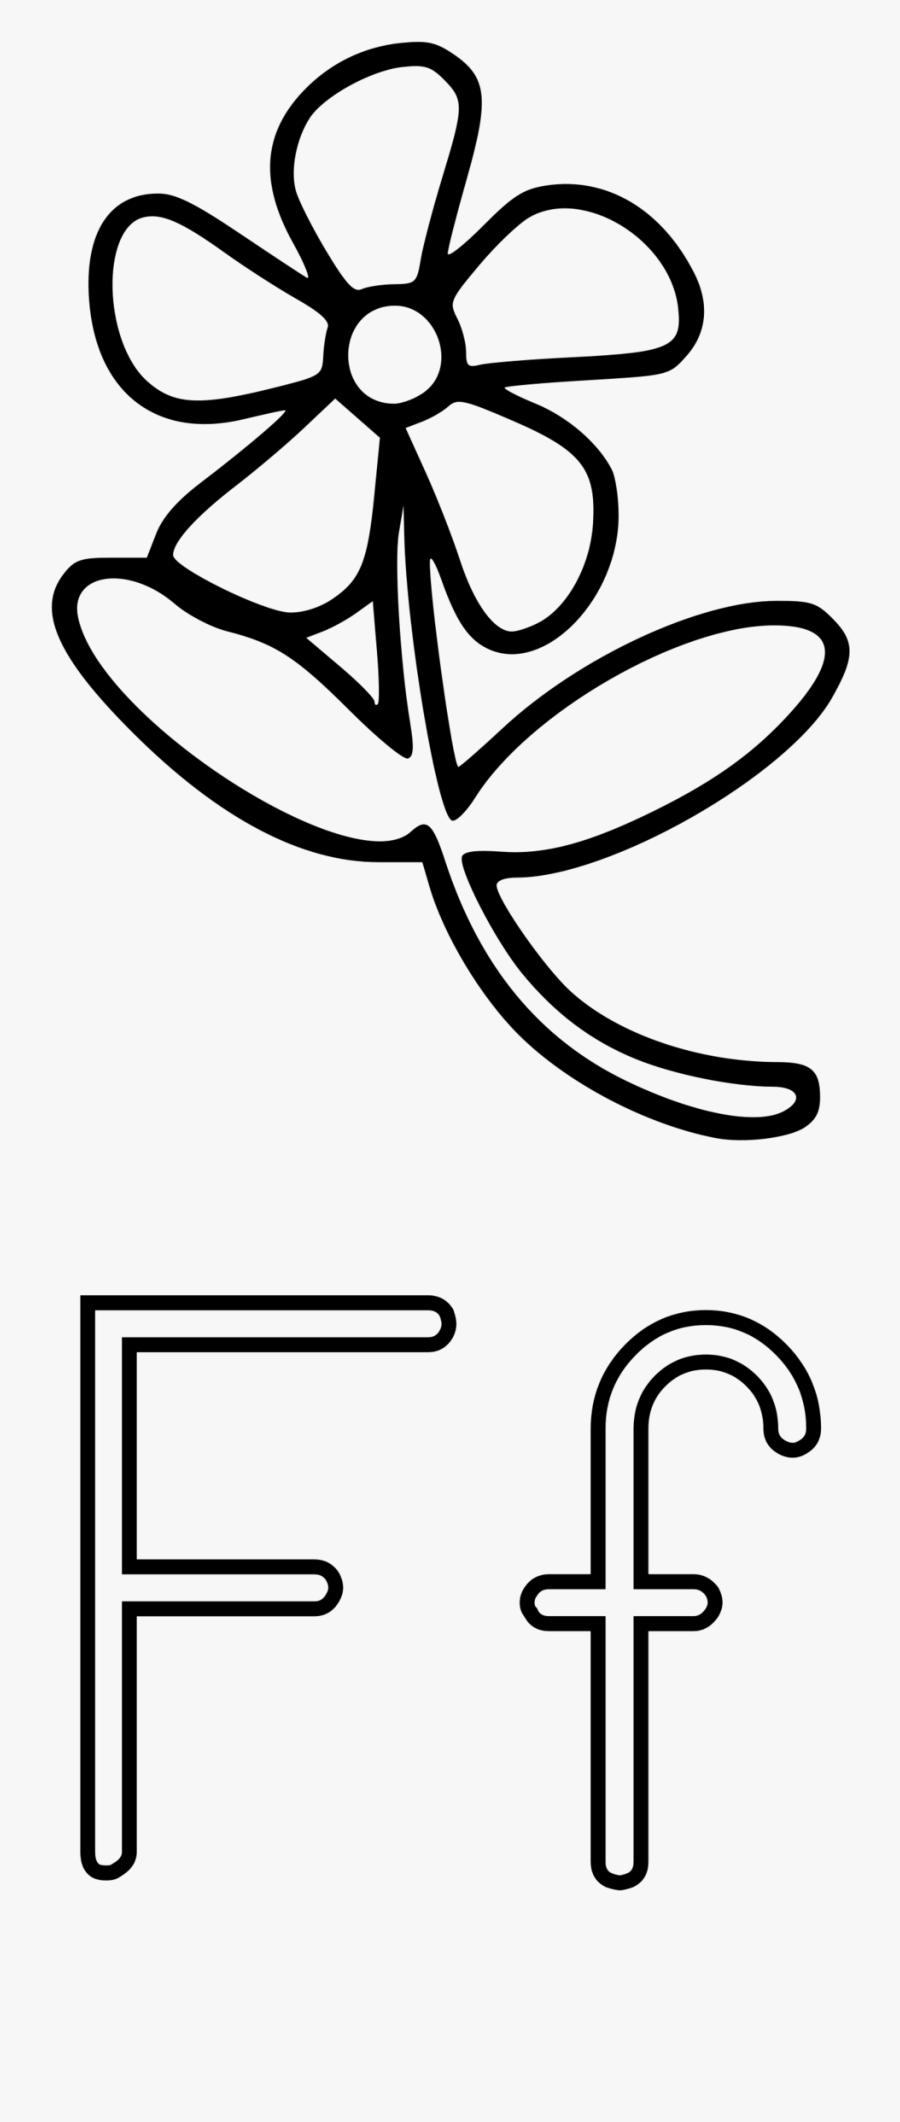 Letters Clipart Black And White - Con La Letra F Dibujos Para Colorear, Transparent Clipart